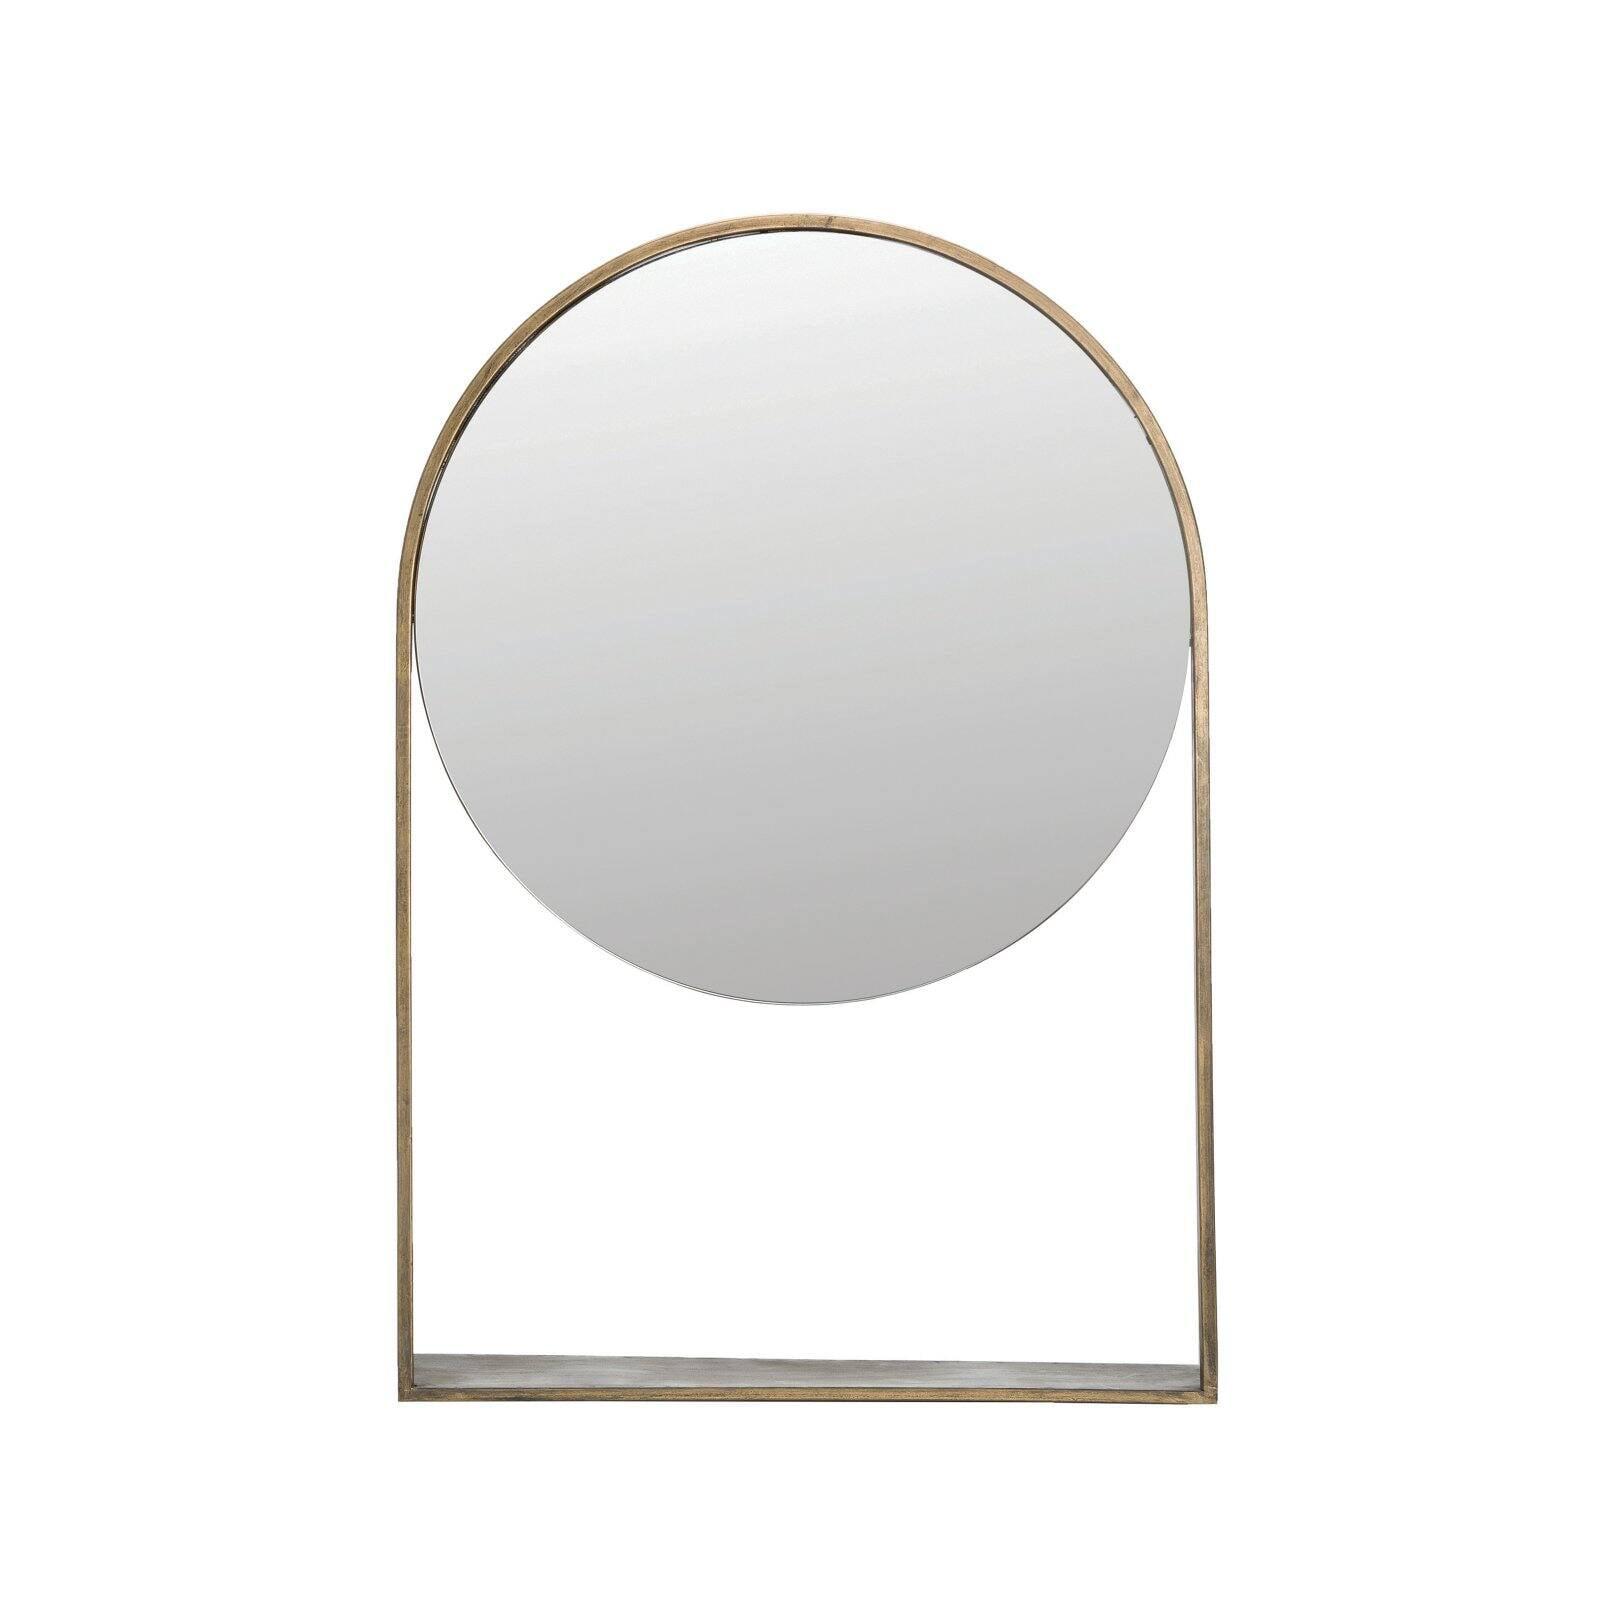 3r Studios Distressed Metal Framed Wall Mirror With Shelf Antique Brass 40 5w X 4 75d X 30h In Walmart Com Walmart Com